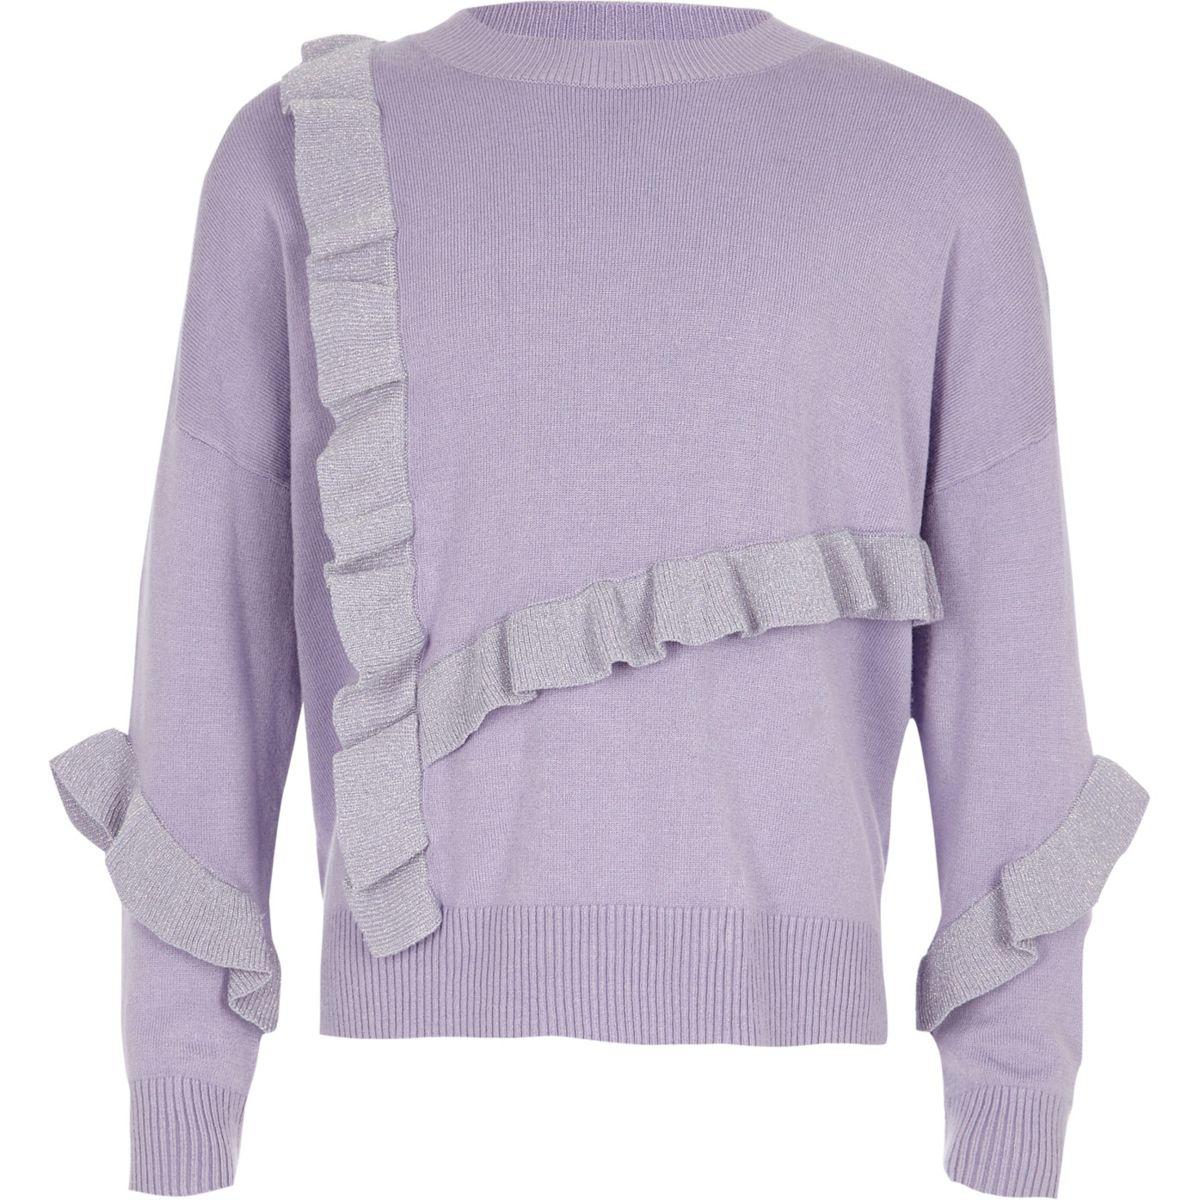 Girls purple glitter knit frill sweater